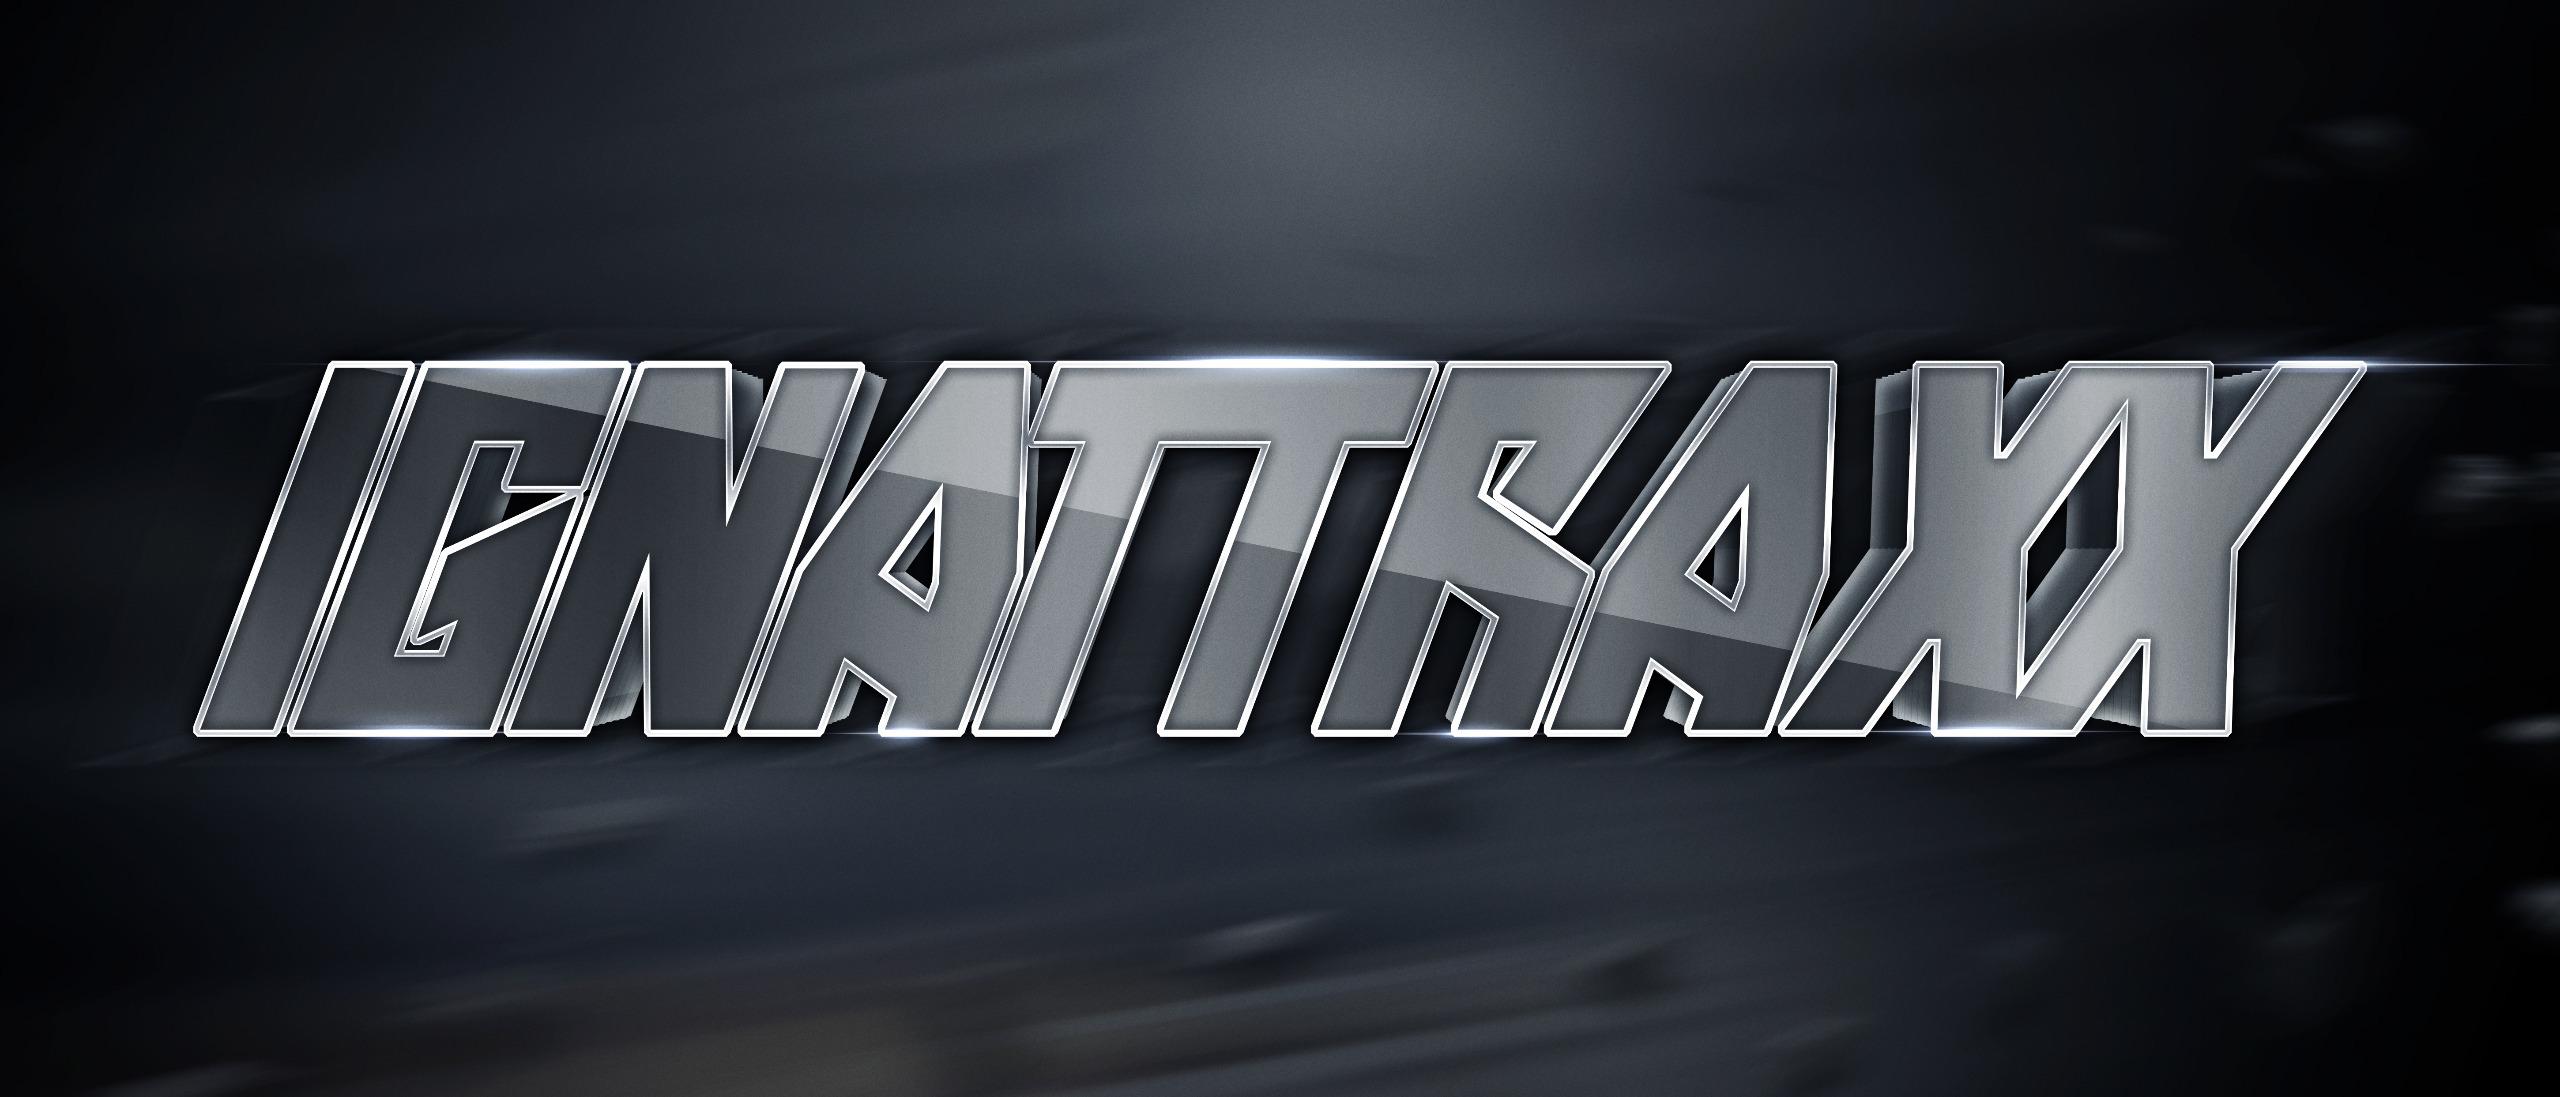 ignattraxx (@umbertron) Cover Image